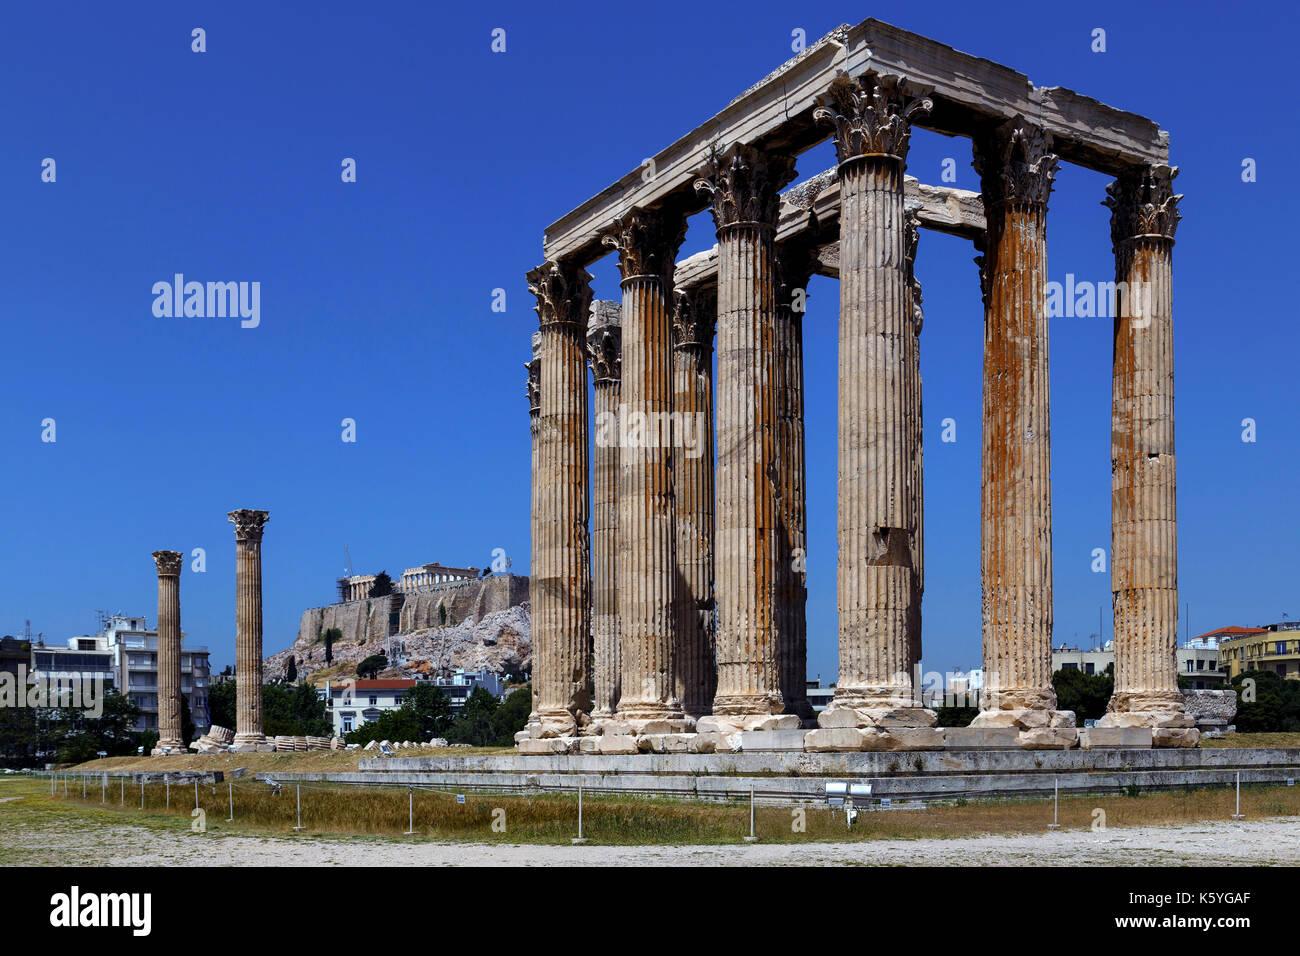 Temple of Olympian Zeus Athens Greece - Stock Image